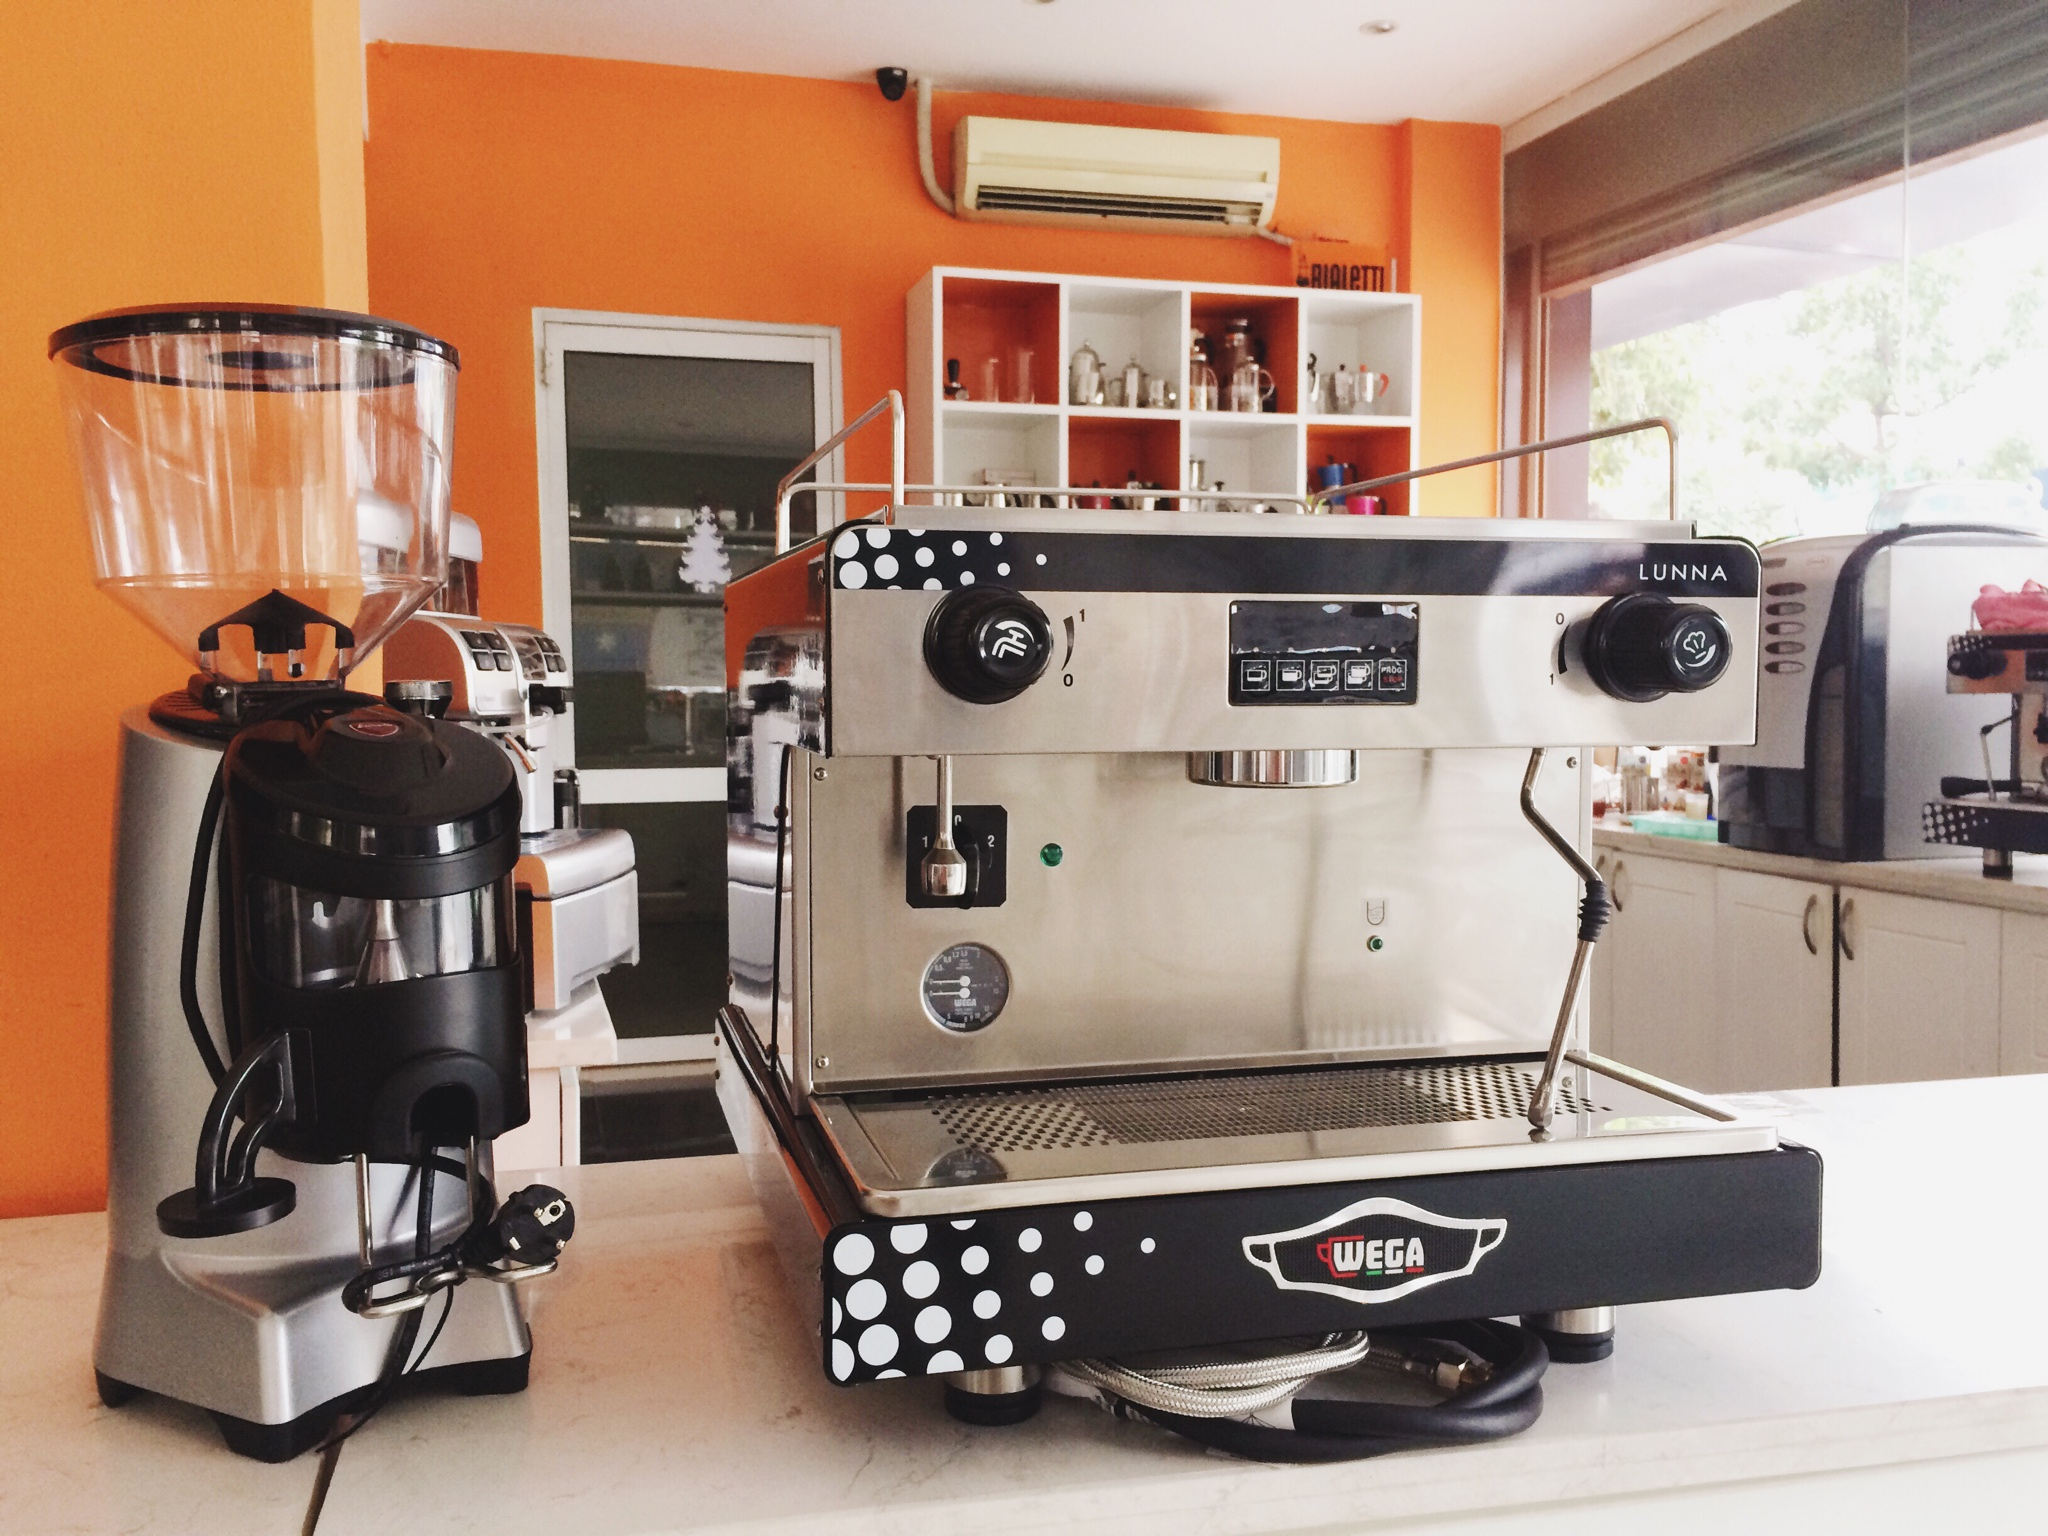 máy pha cà phê Wega Lunna